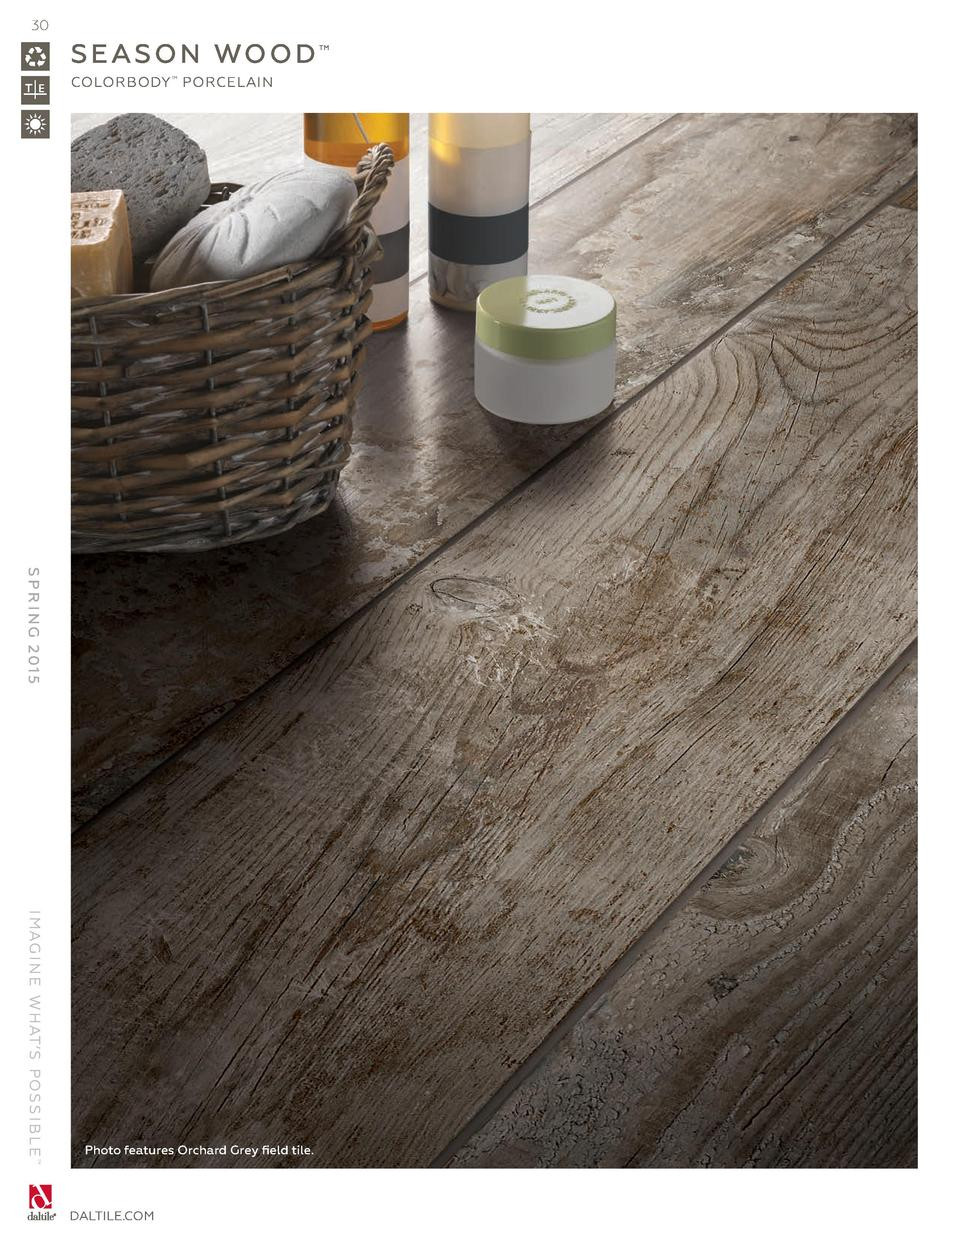 discount hardwood flooring dalton ga of daltile spring 2015 catalog simplebooklet com inside 30 s e a s o n wo o d colorbody porcelain s p r i n g 2 01 5 i mag i n e w hat s po